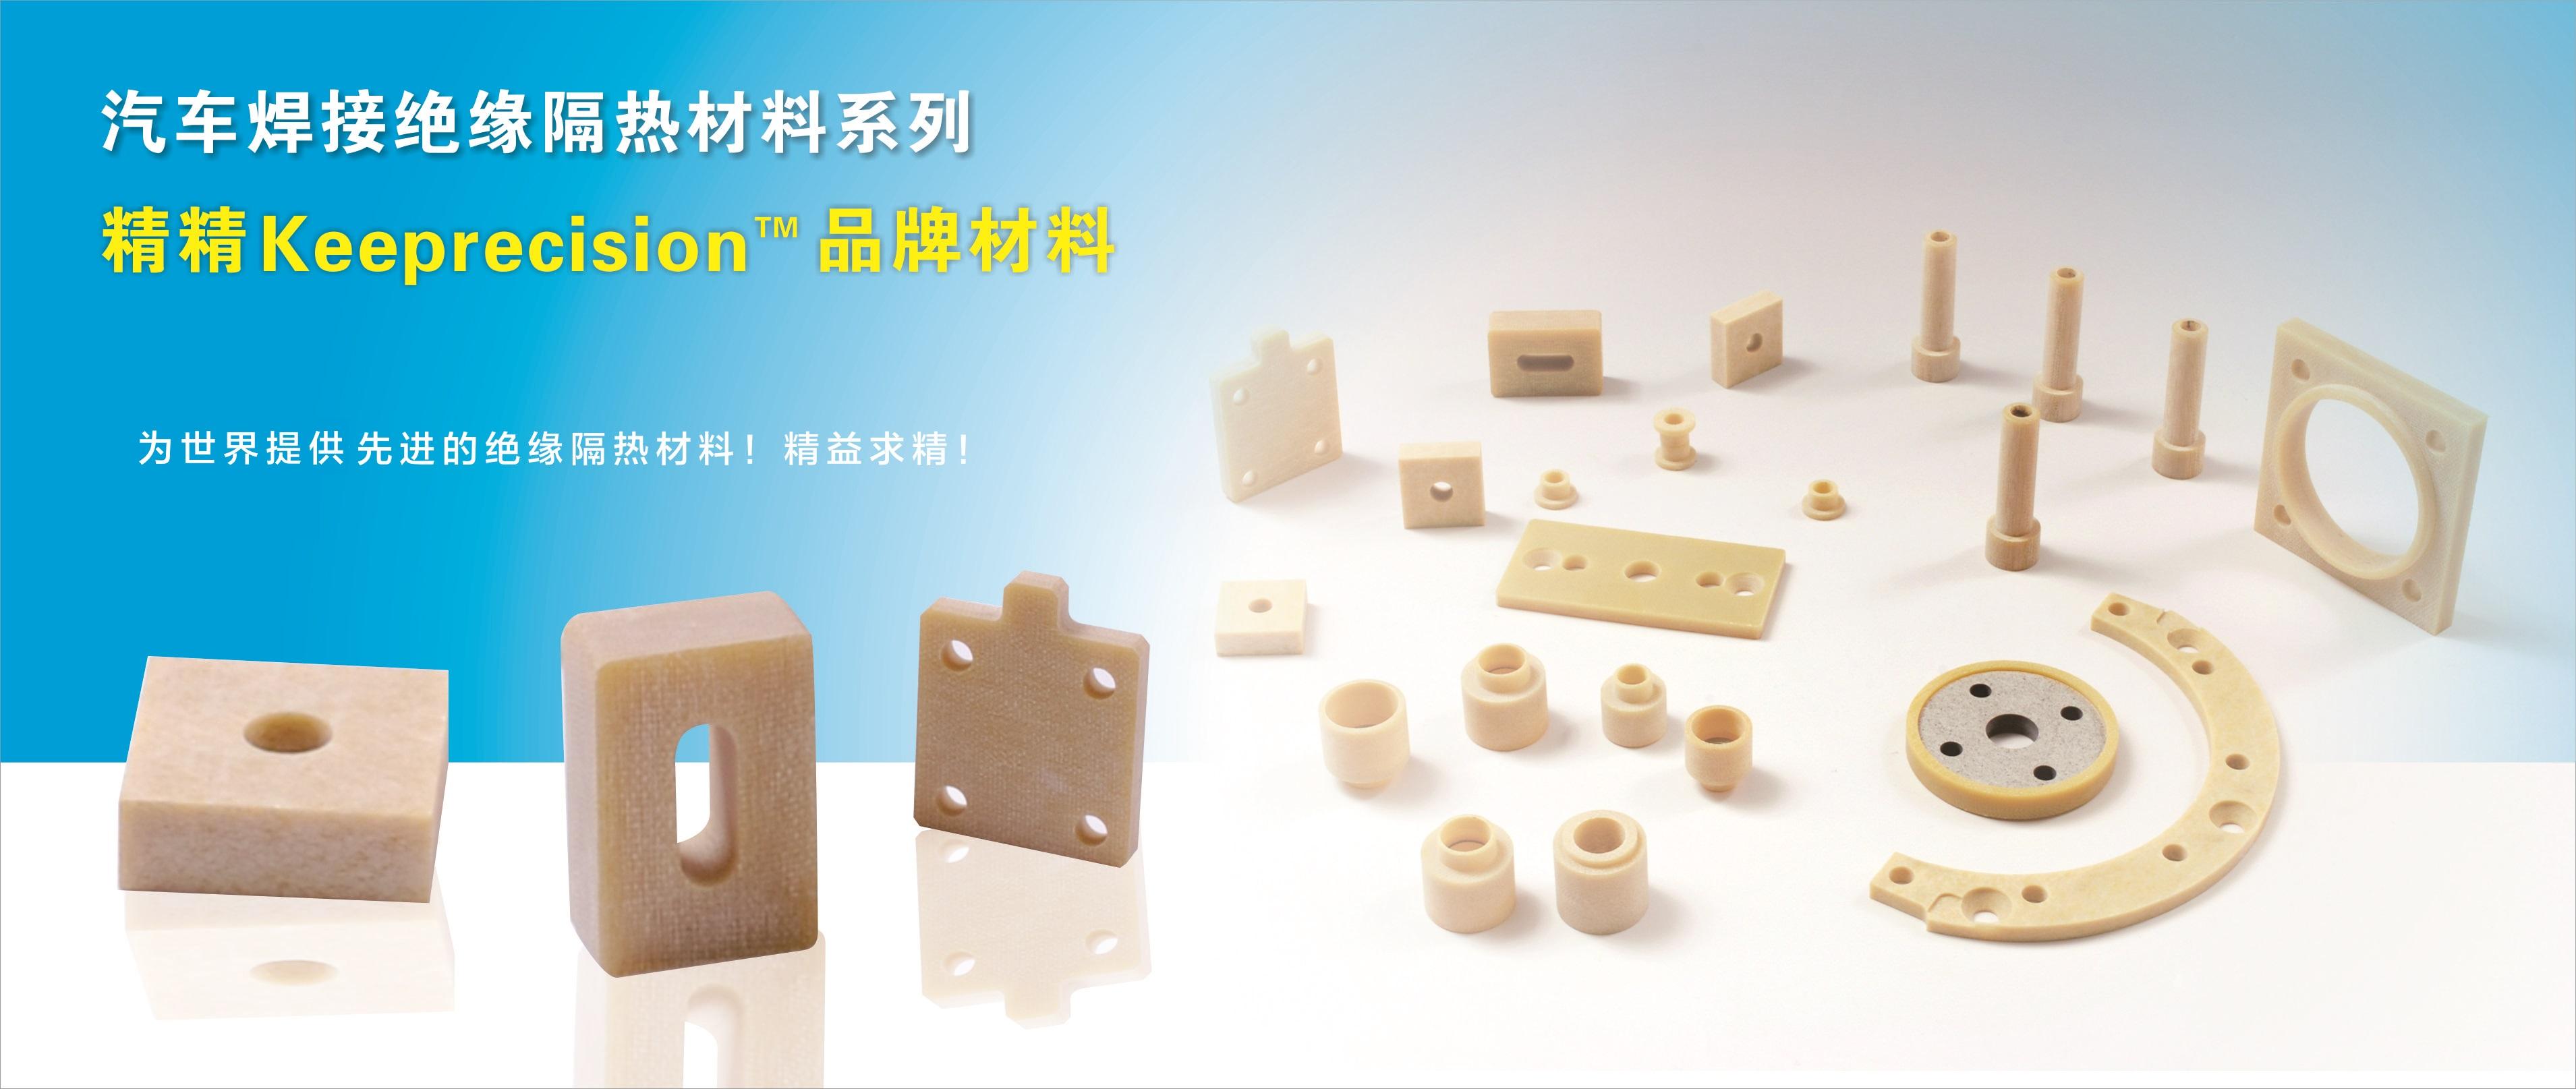 焊接隔热材料